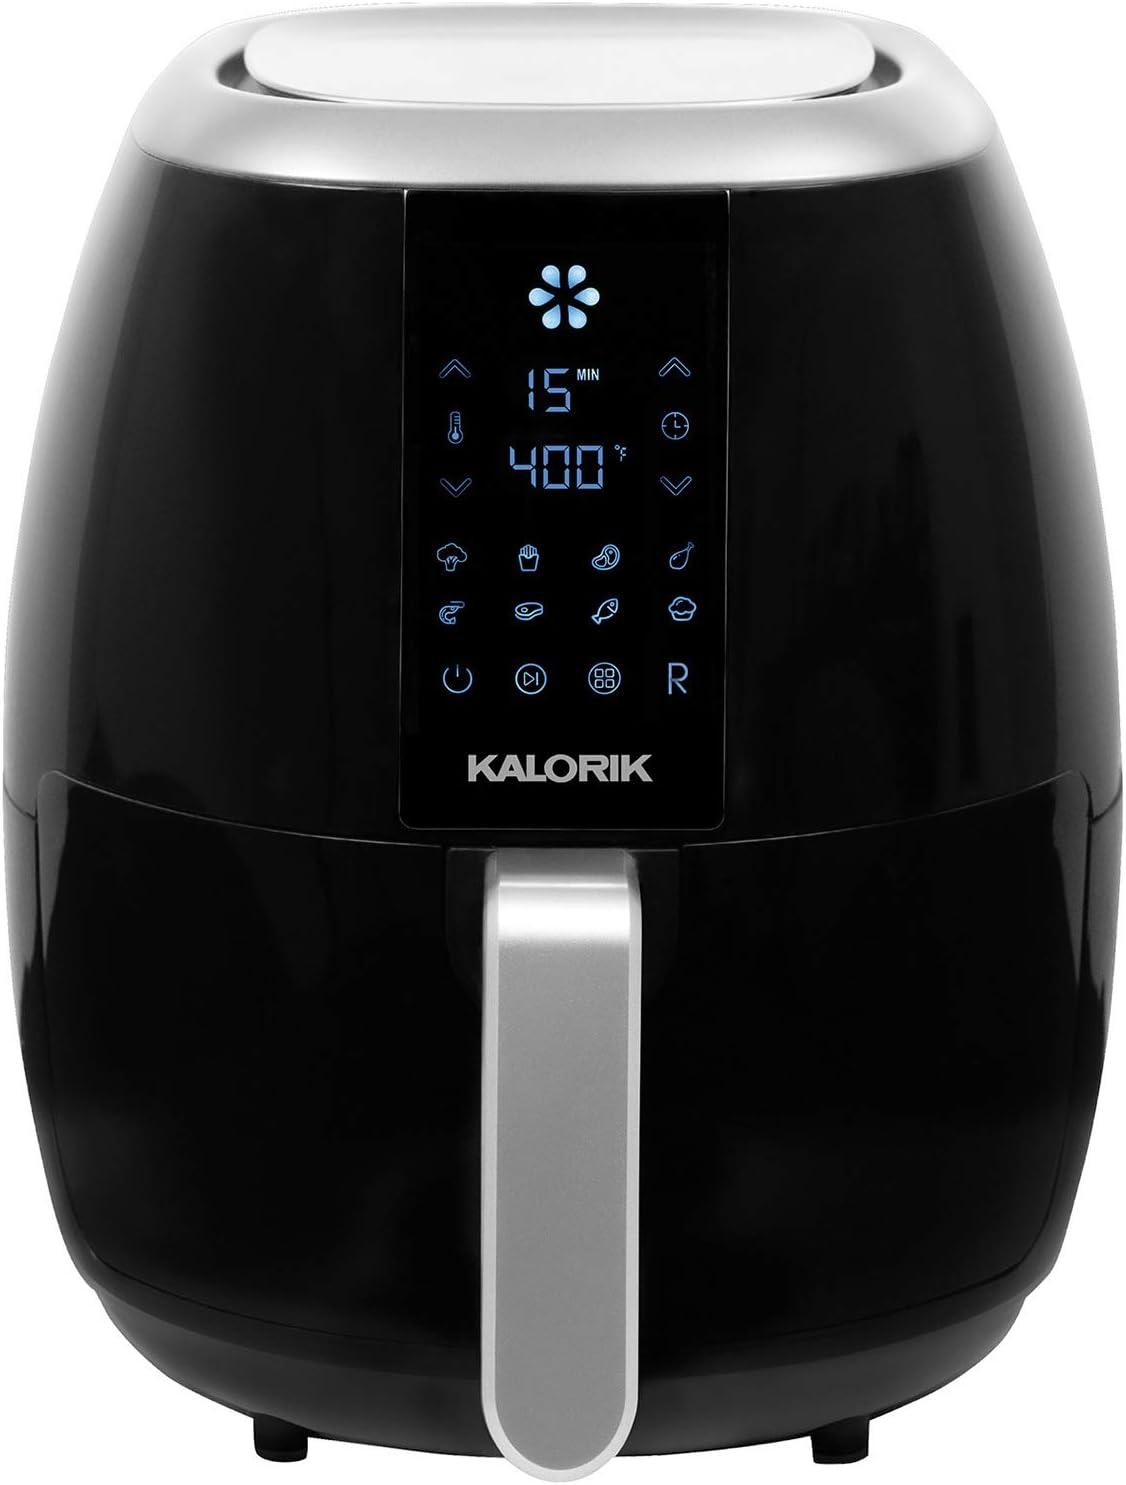 Kalorik 3.0 Quart Digital Airfryer, Black